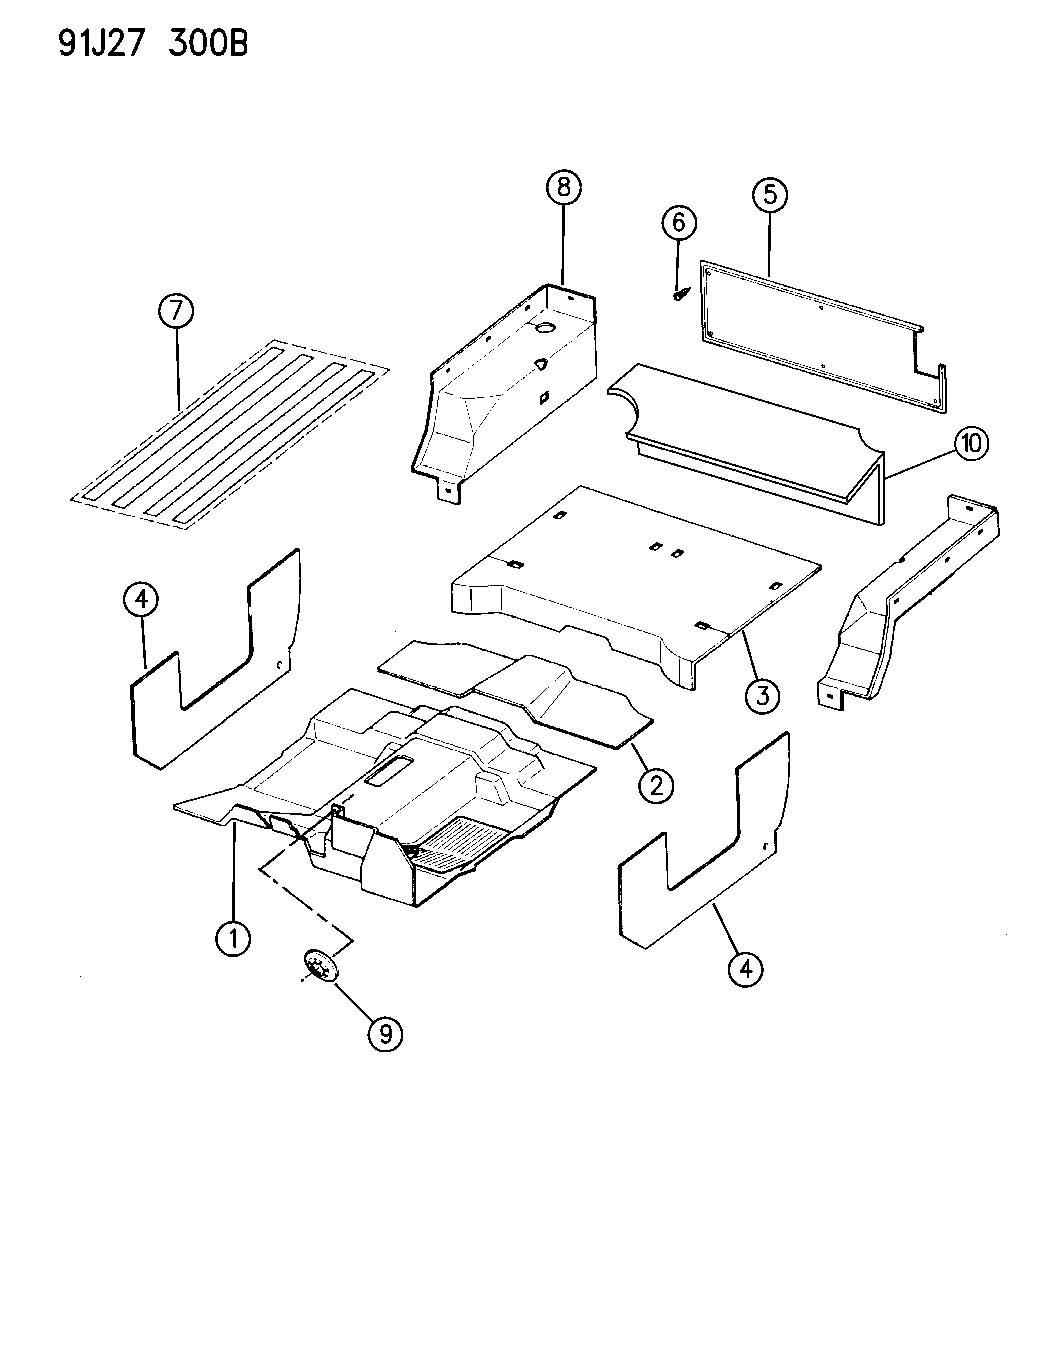 1991 Jeep Yj Parts Diagram Seat. Jeep. Auto Wiring Diagram